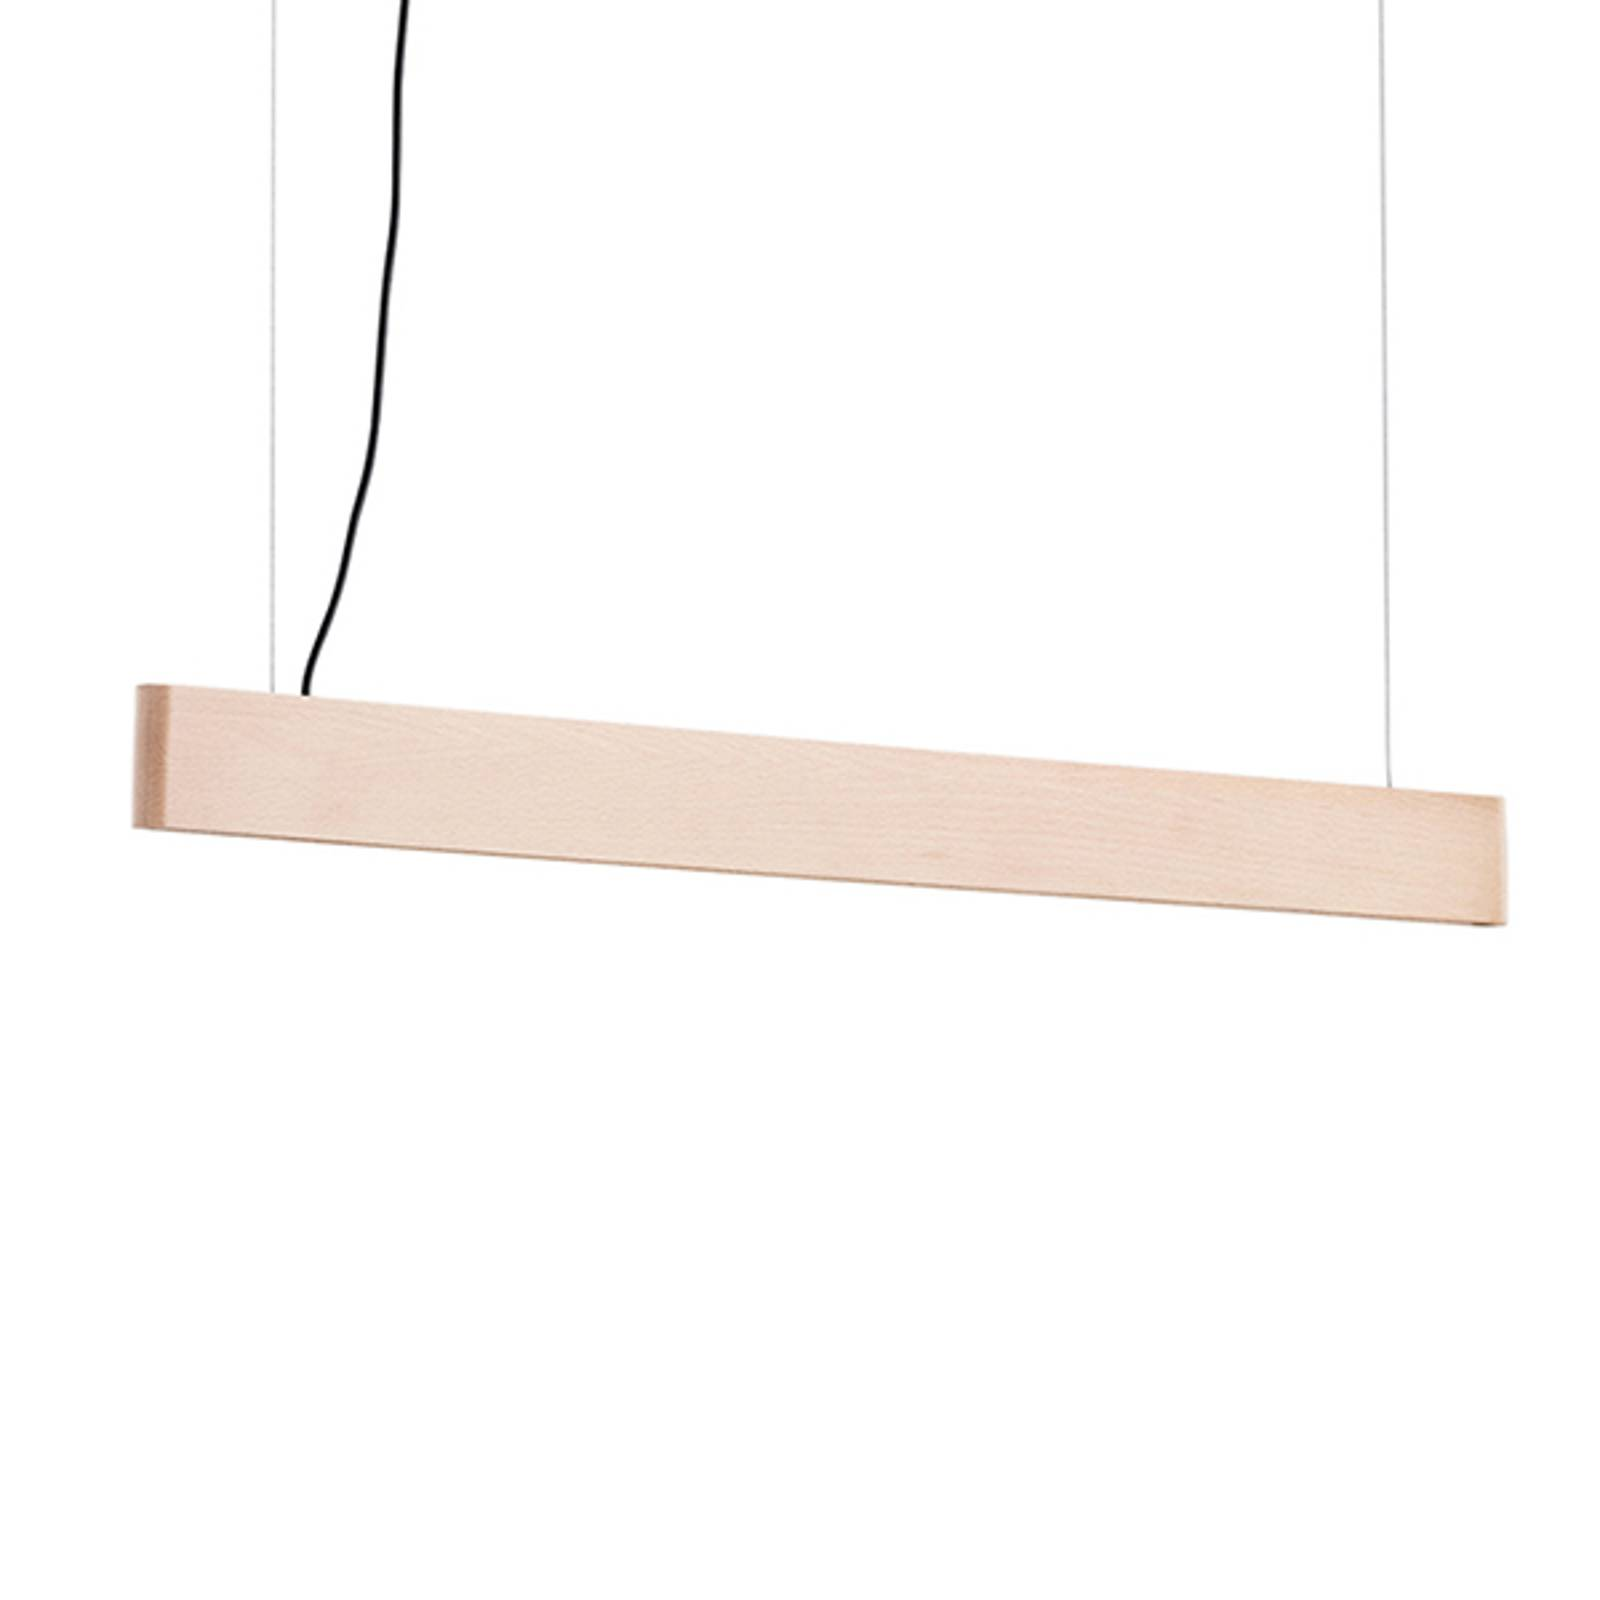 LED-Pendelleuchte Abbon mit Holzschirm, buche,70cm